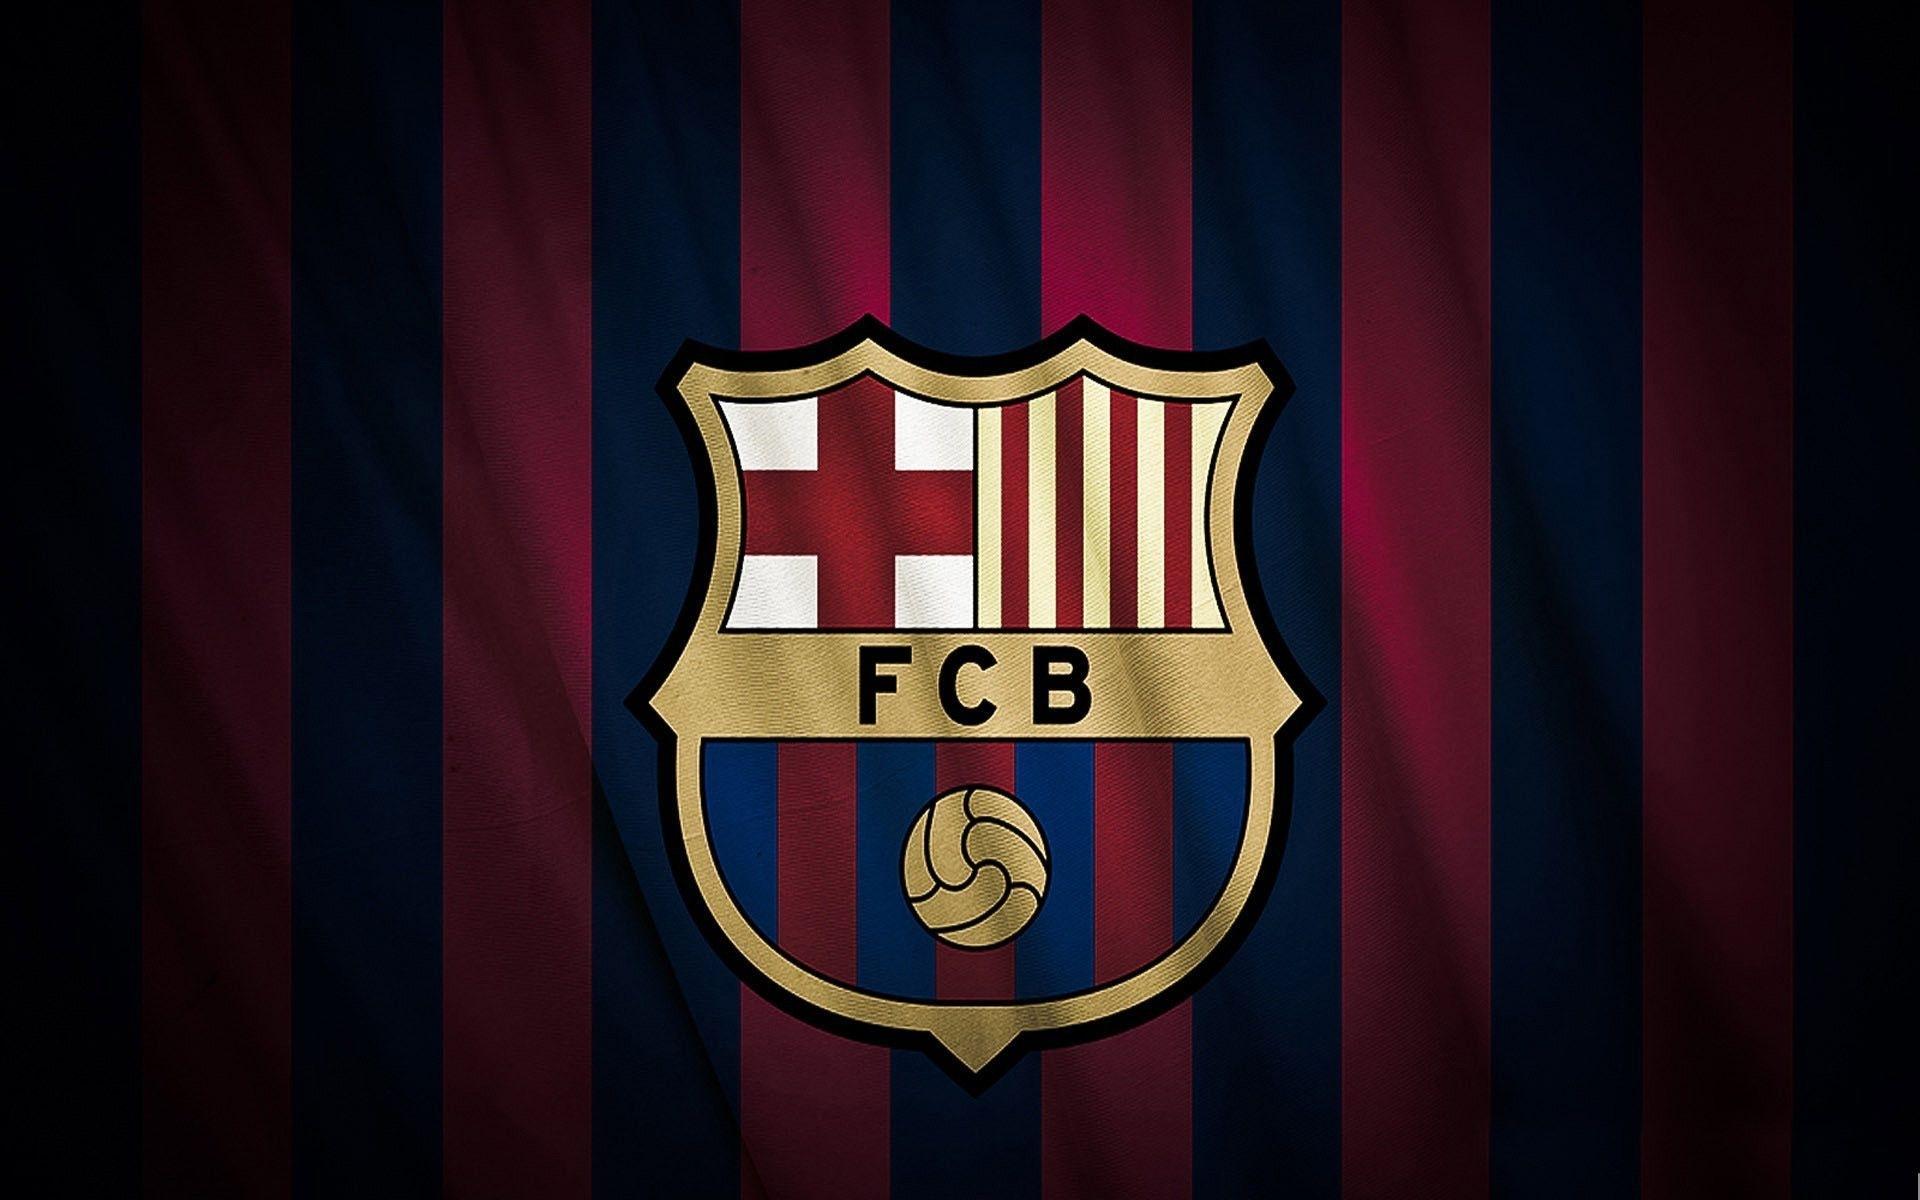 fc barcelona logo 2014 wallpaper wide or hd | sports wallpapers